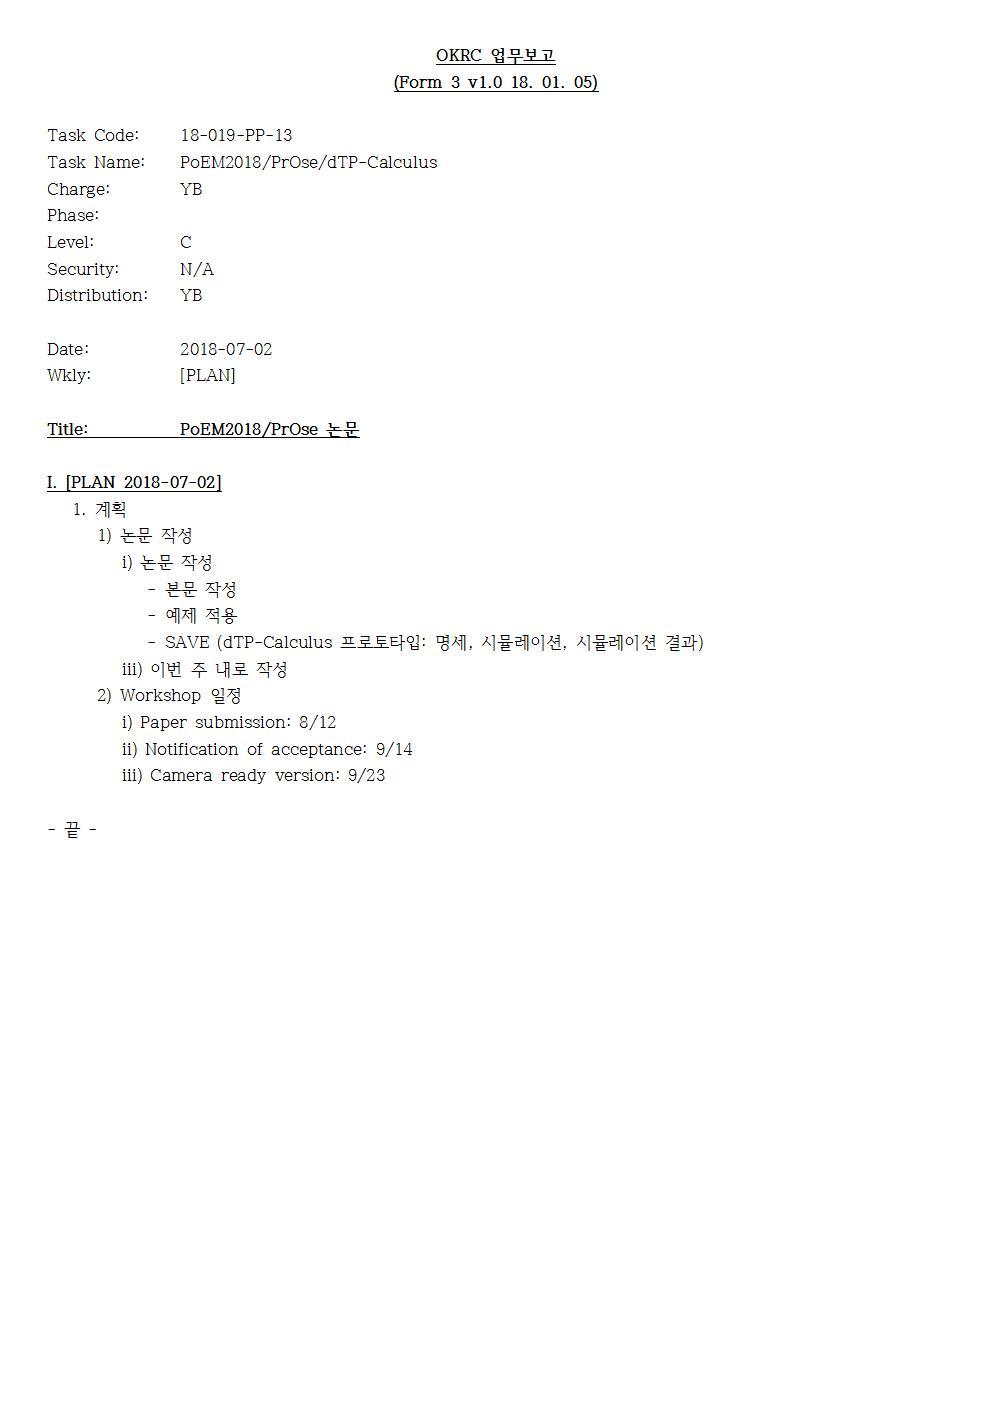 D-[18-019-PP-13]-[POEM]-[2018-07-02][YB]001.jpg